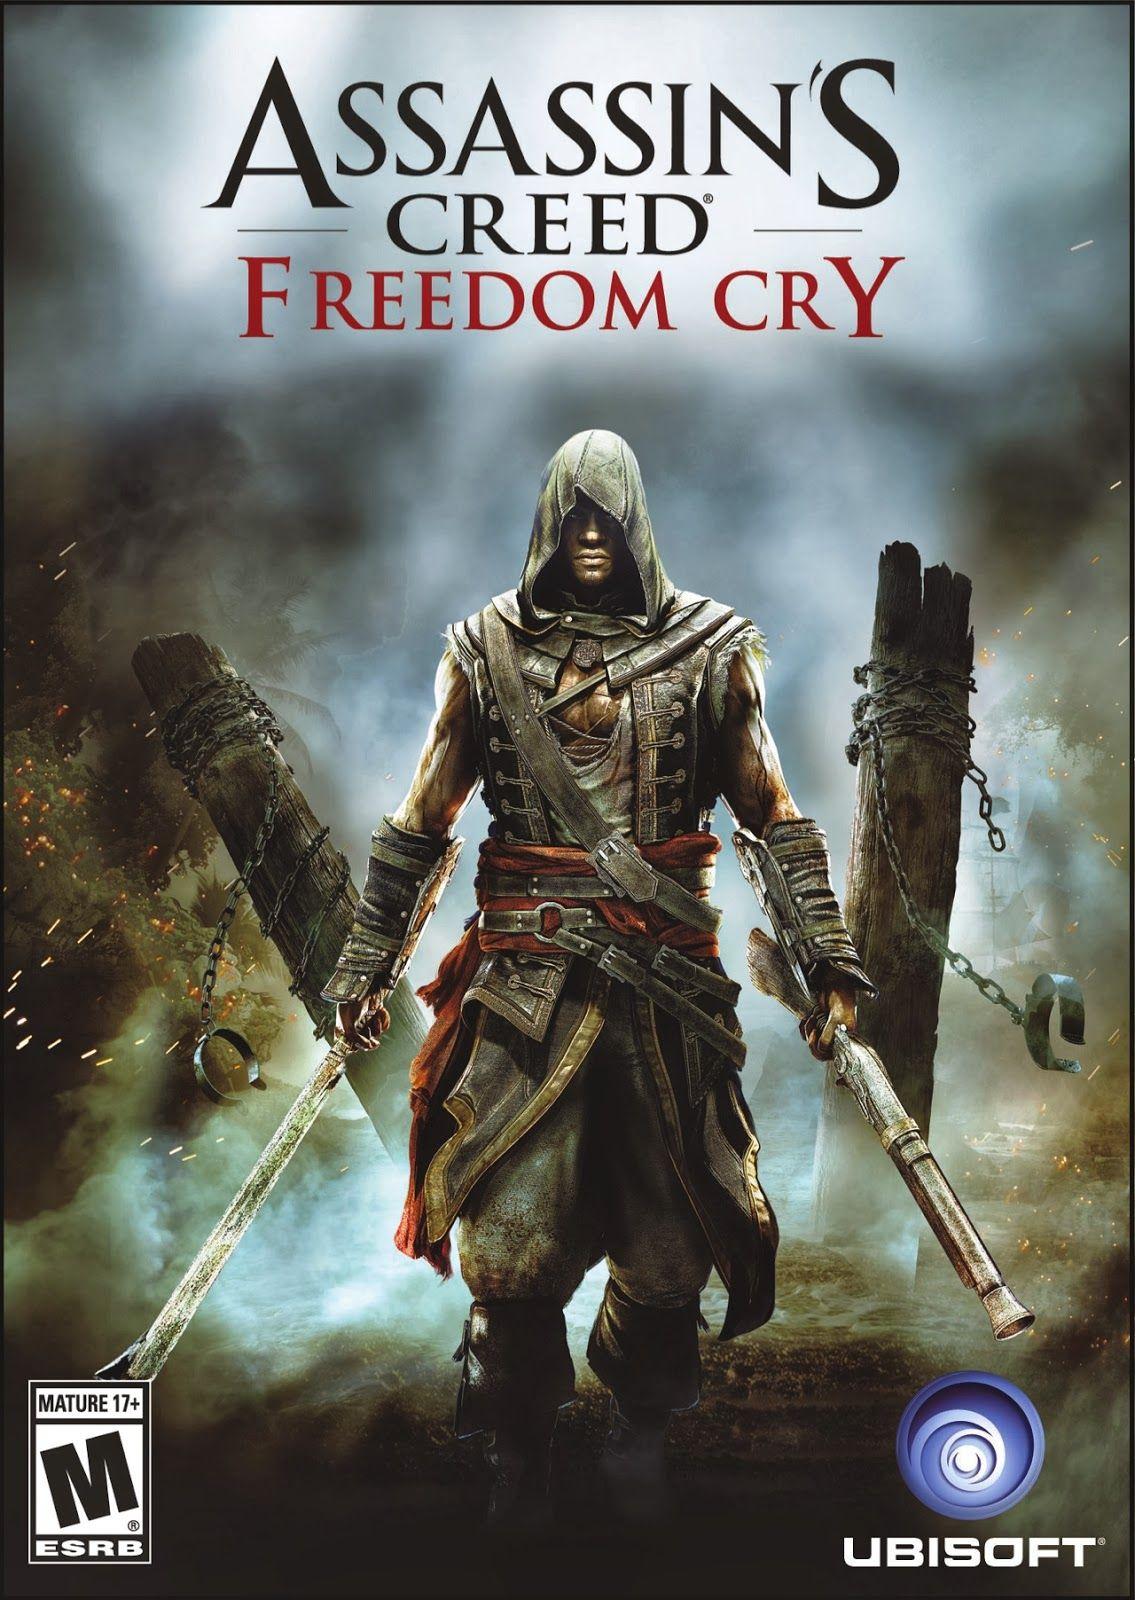 Playstation 4 Ps4 Ps4 Sx Assassins Creed Assassins Creed 4 Assassins Creed Art